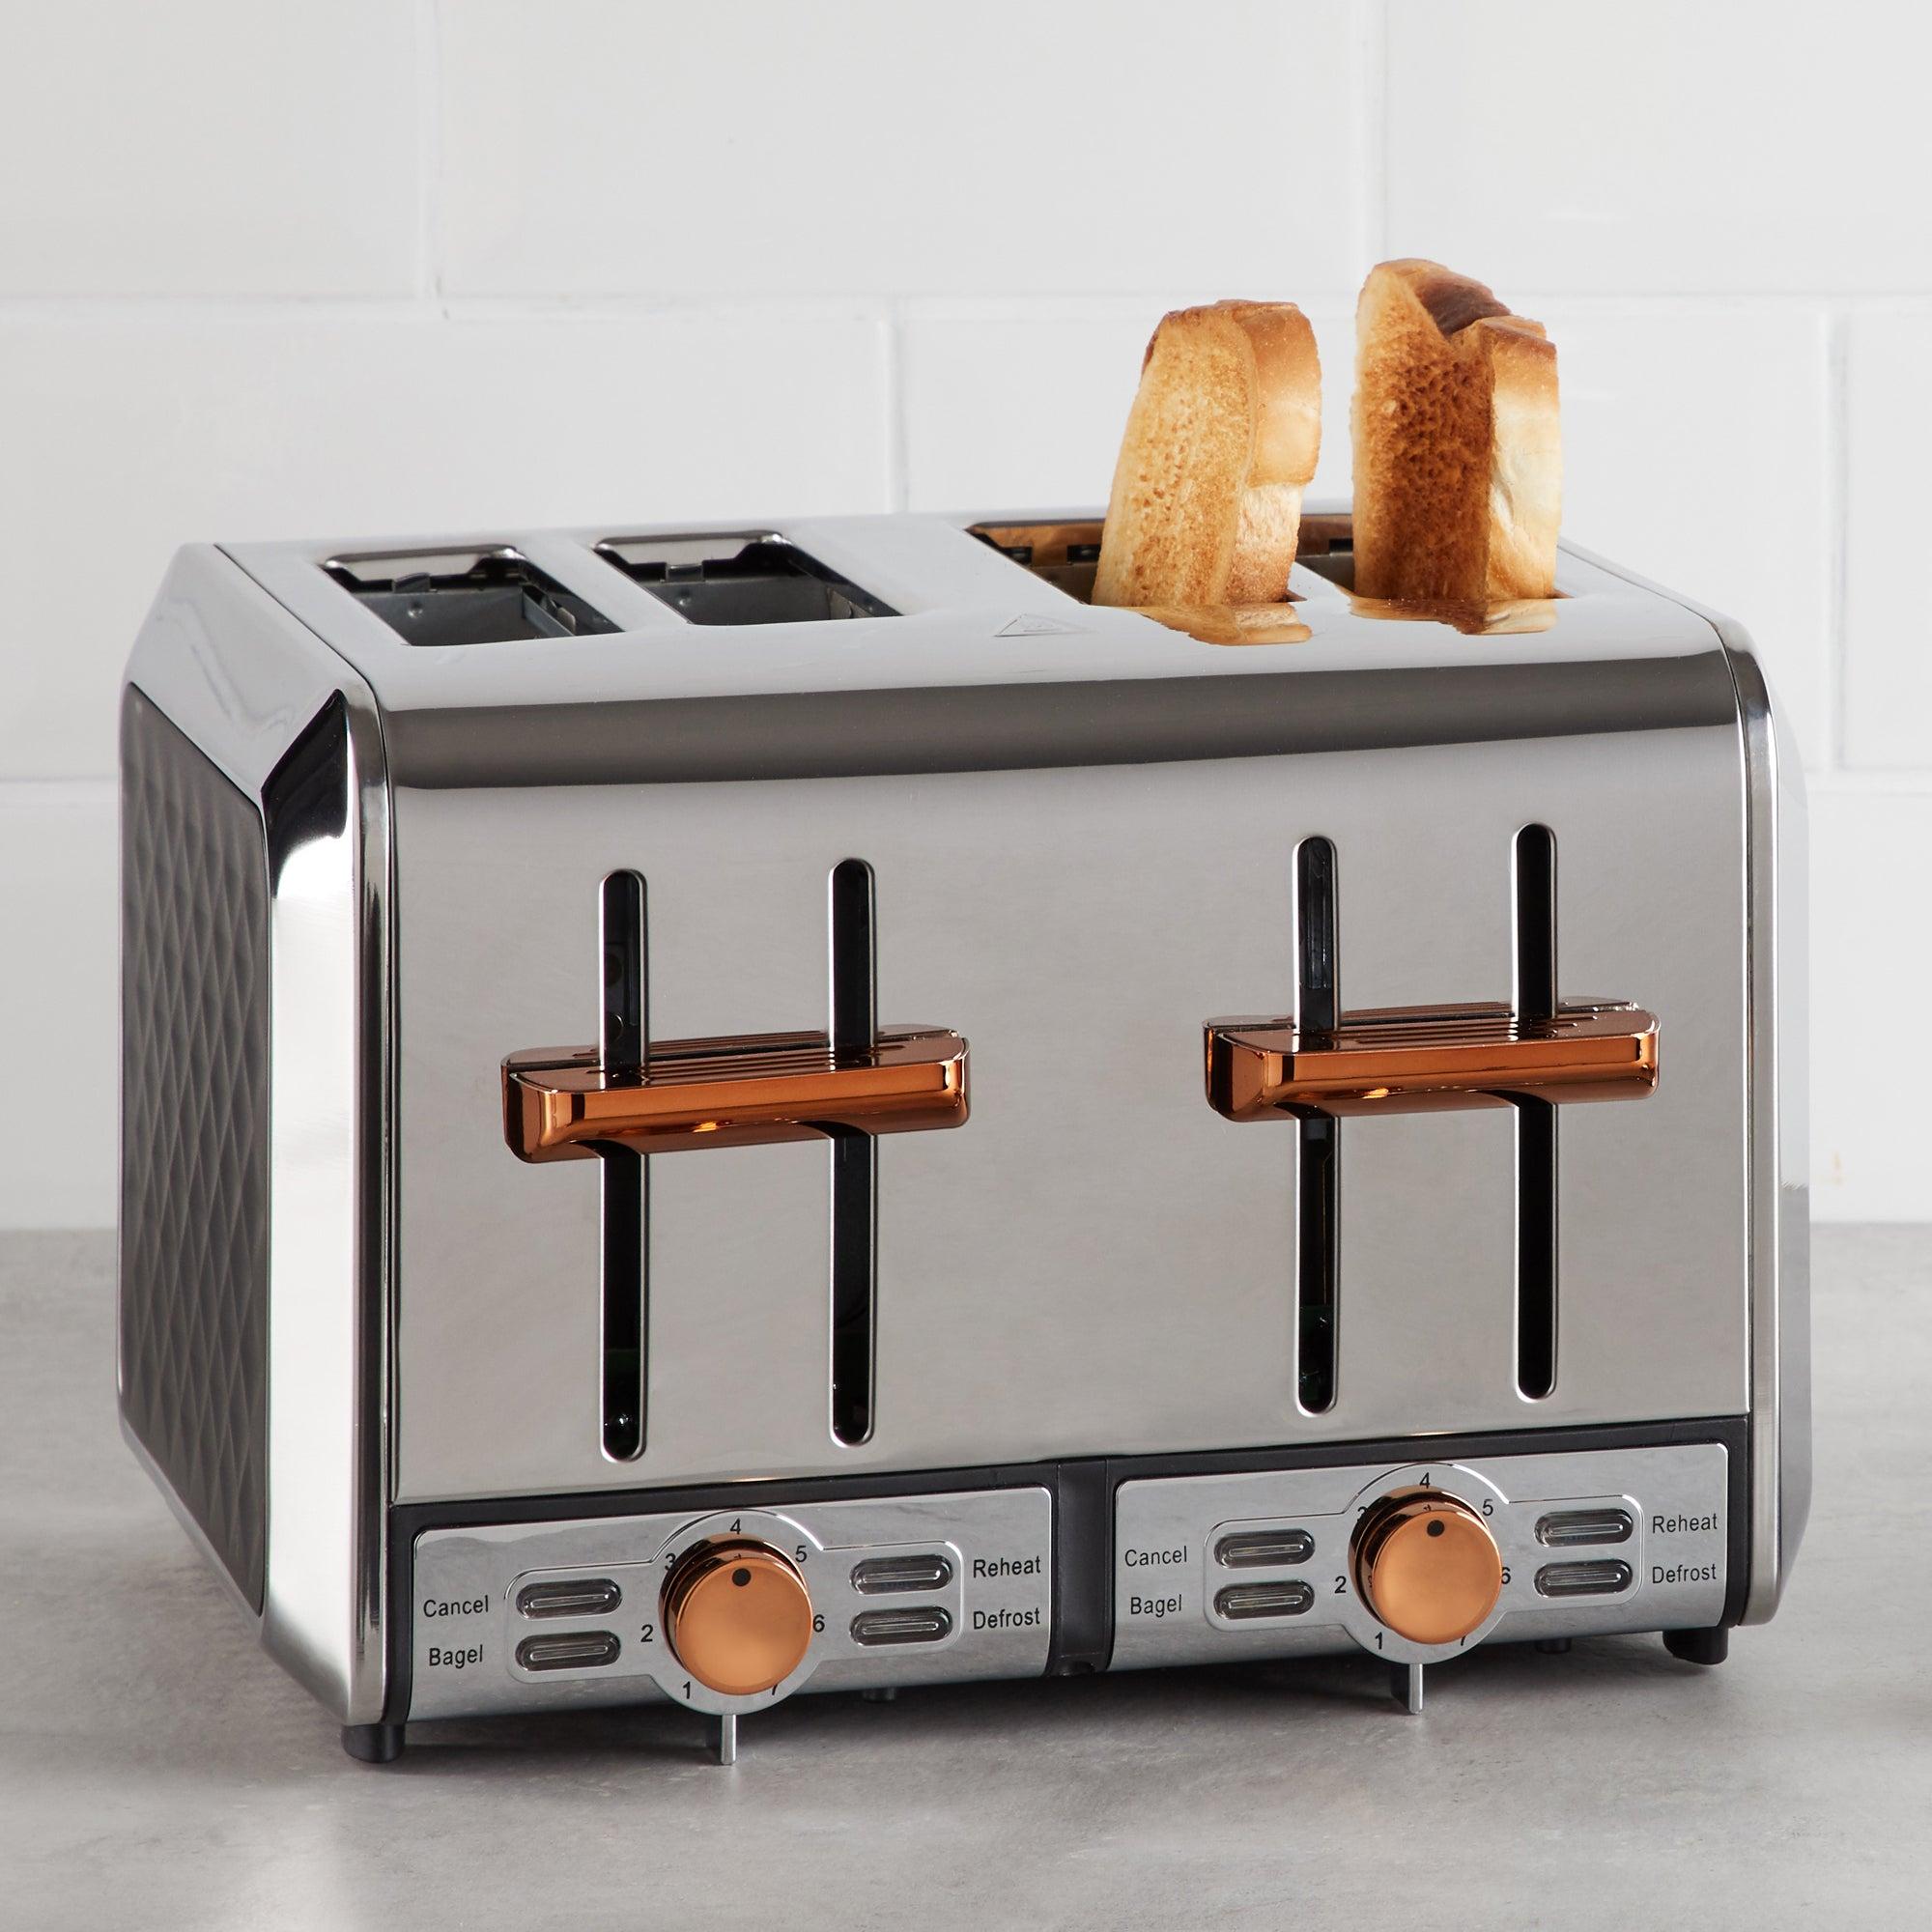 Elements 4 Slice Black and Copper Toaster Black and Orange